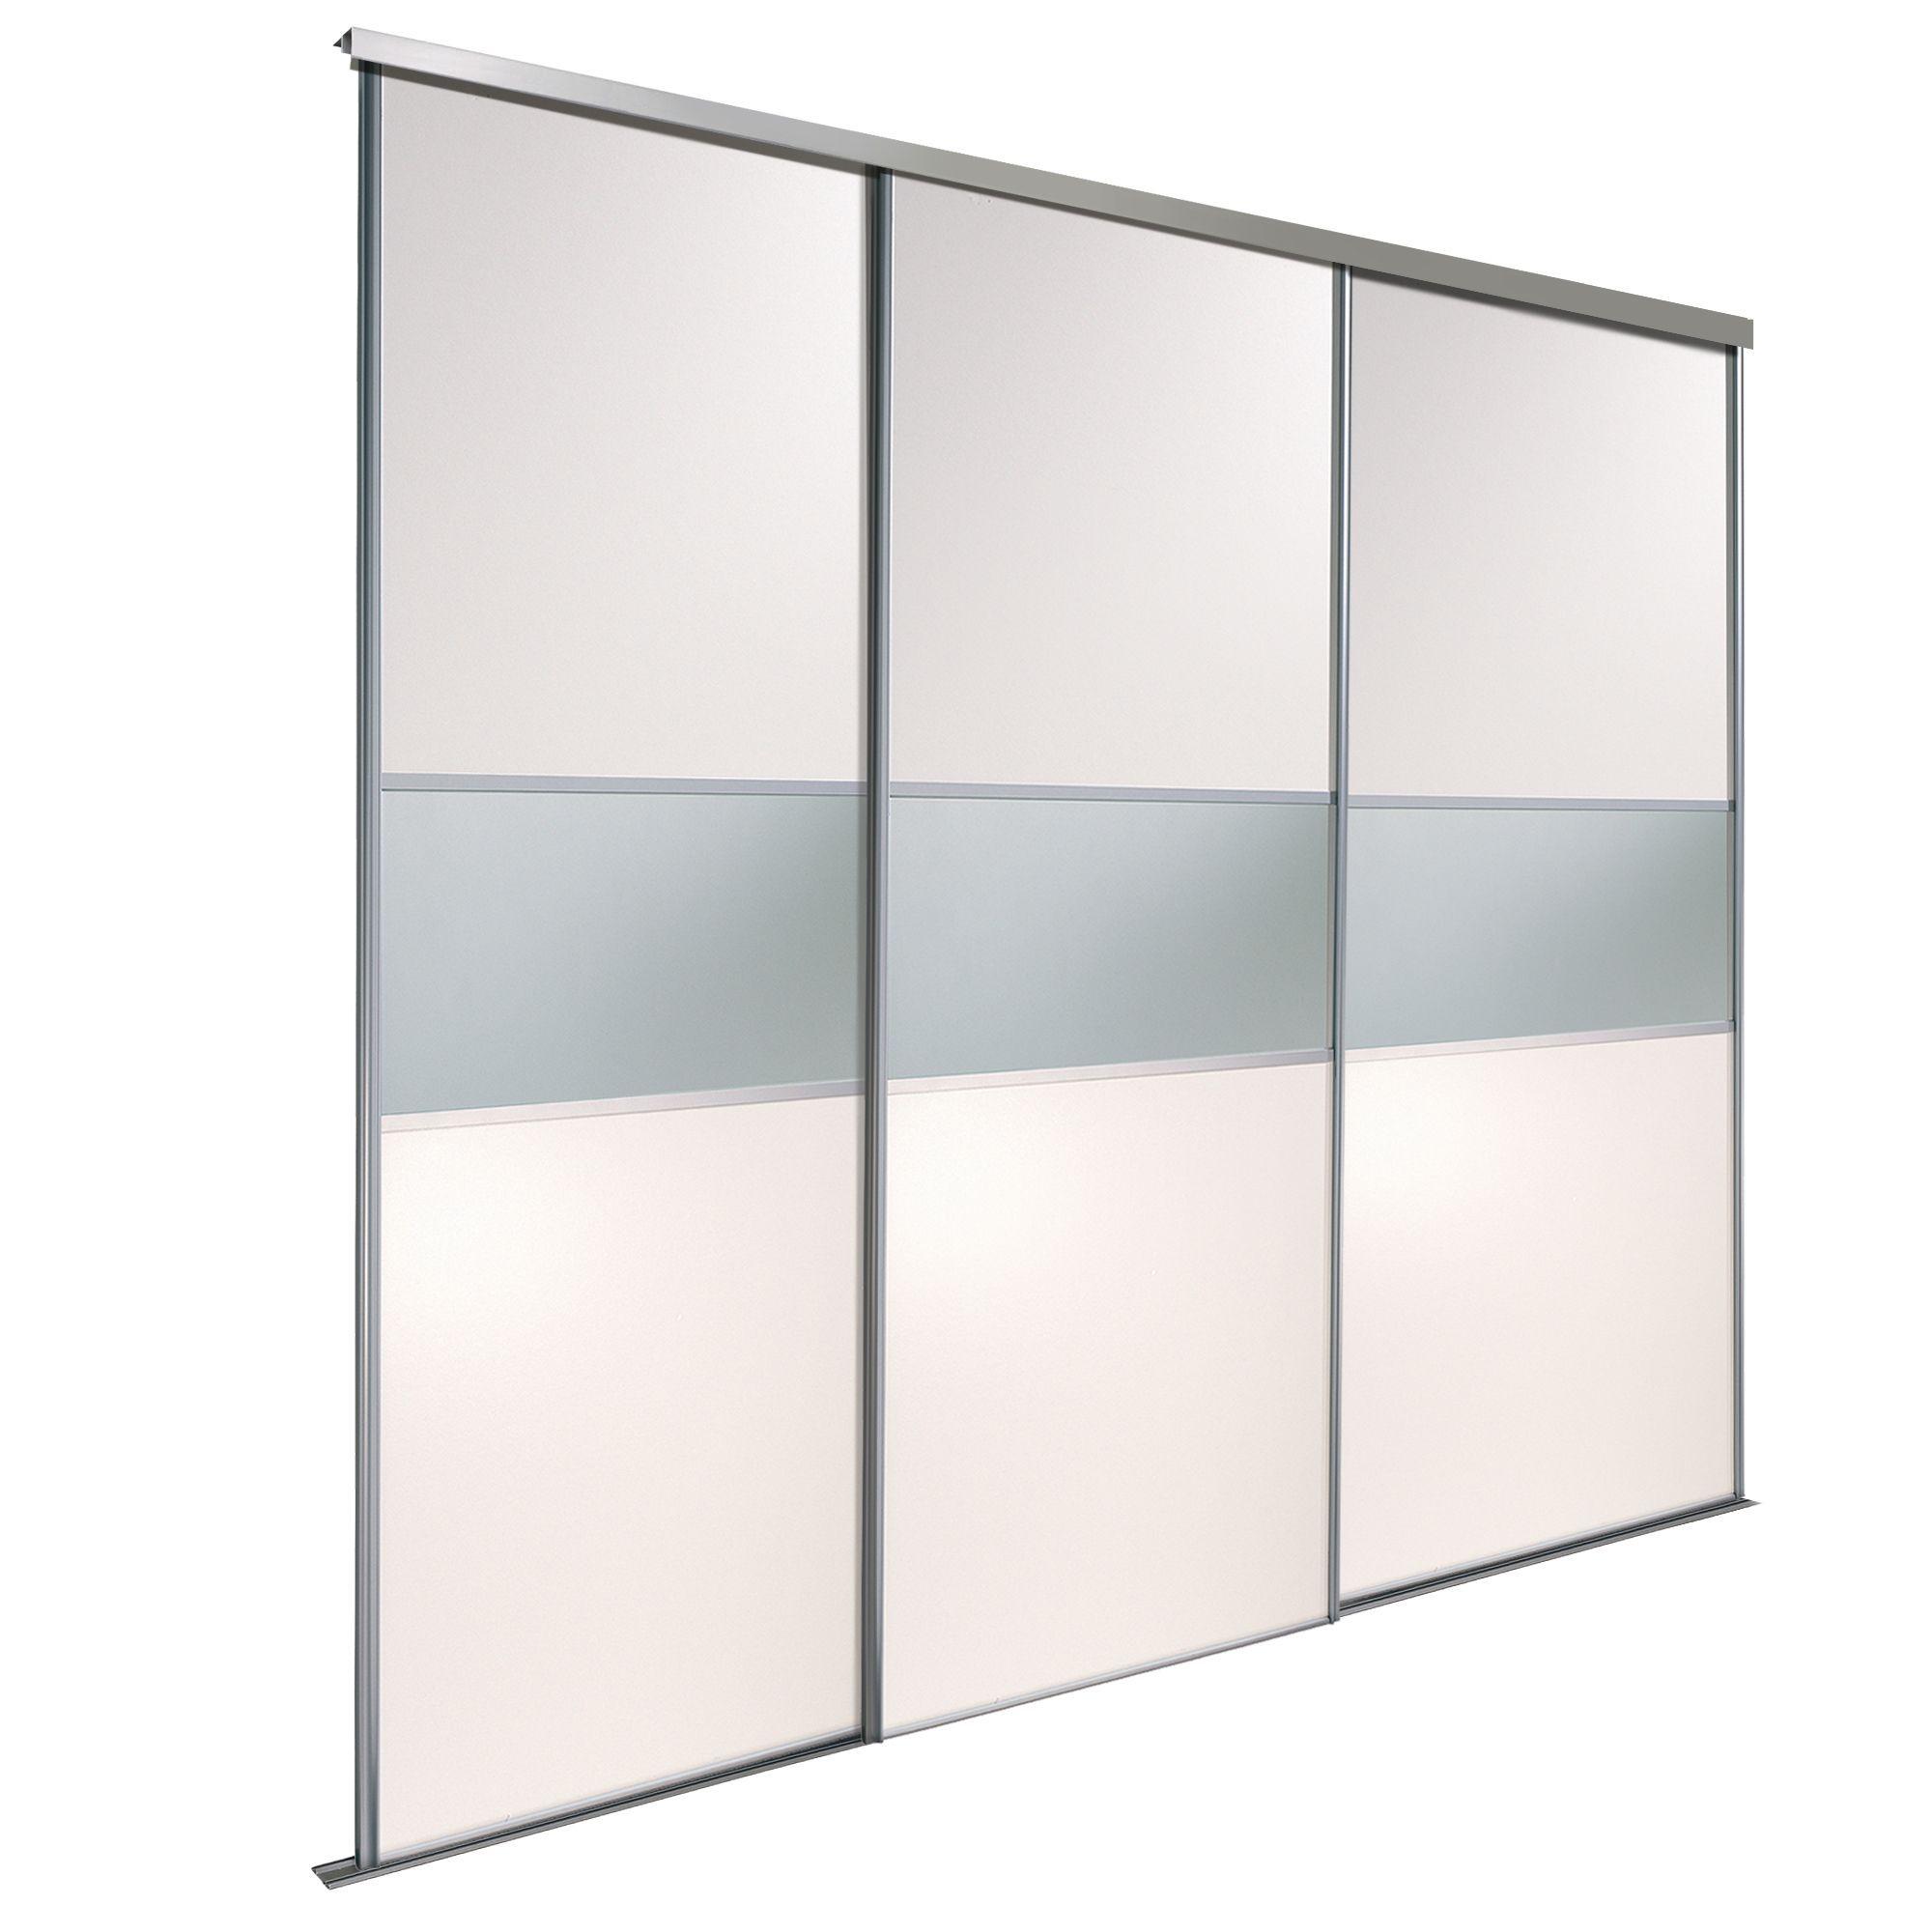 Fineline White Mirror Sliding Wardrobe Door Kit (H)2220 mm (W)914 mm Pack of 3  sc 1 st  Pinterest & Fineline White Mirror Sliding Wardrobe Door Kit (H)2220 mm (W)914 mm ...